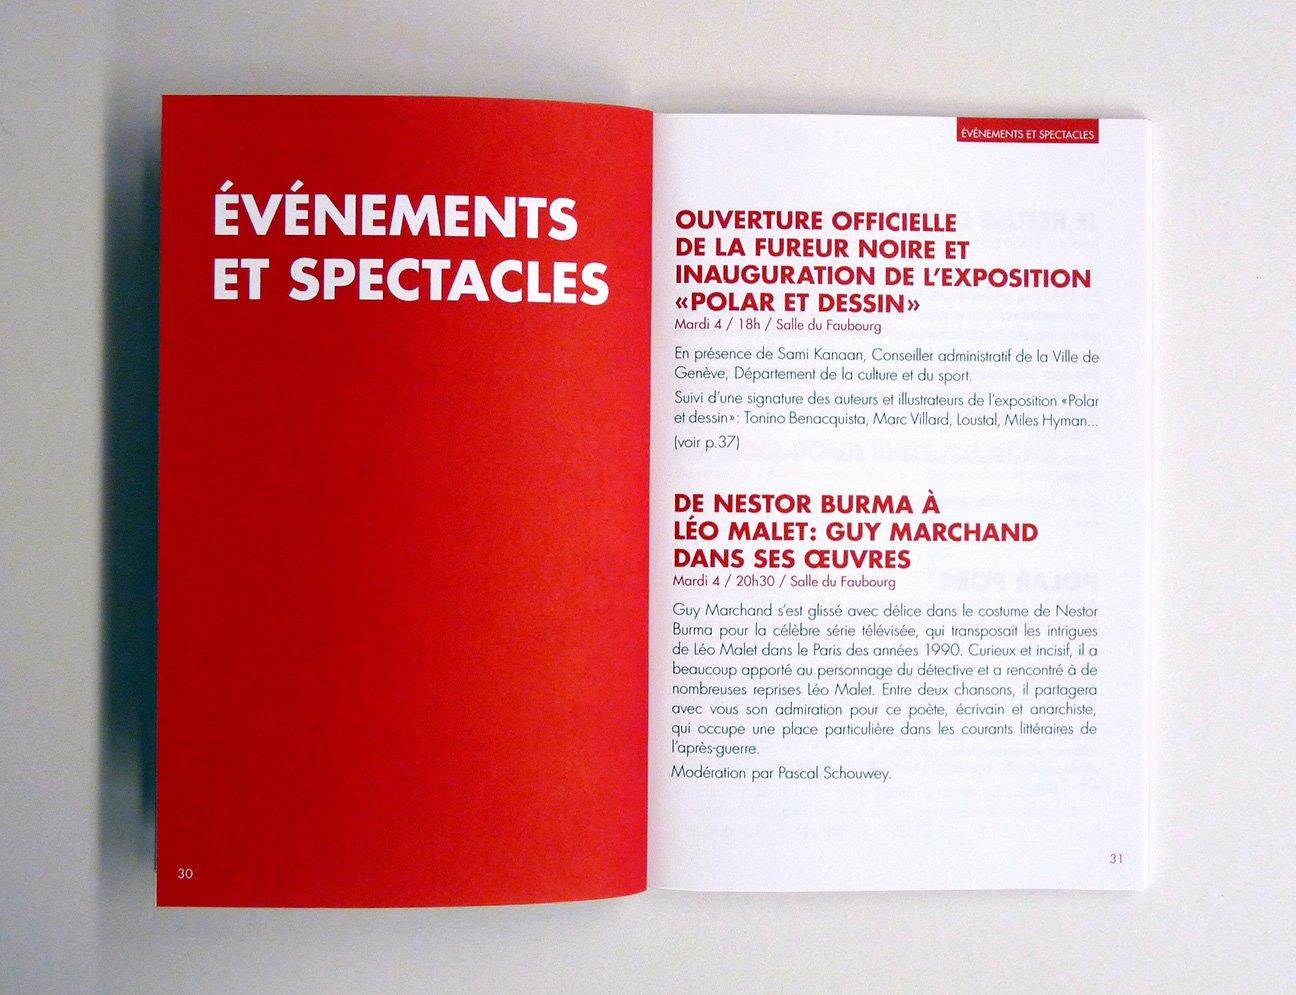 fabien_cuffel_book_festival_litteraire_fureur_lire_2011